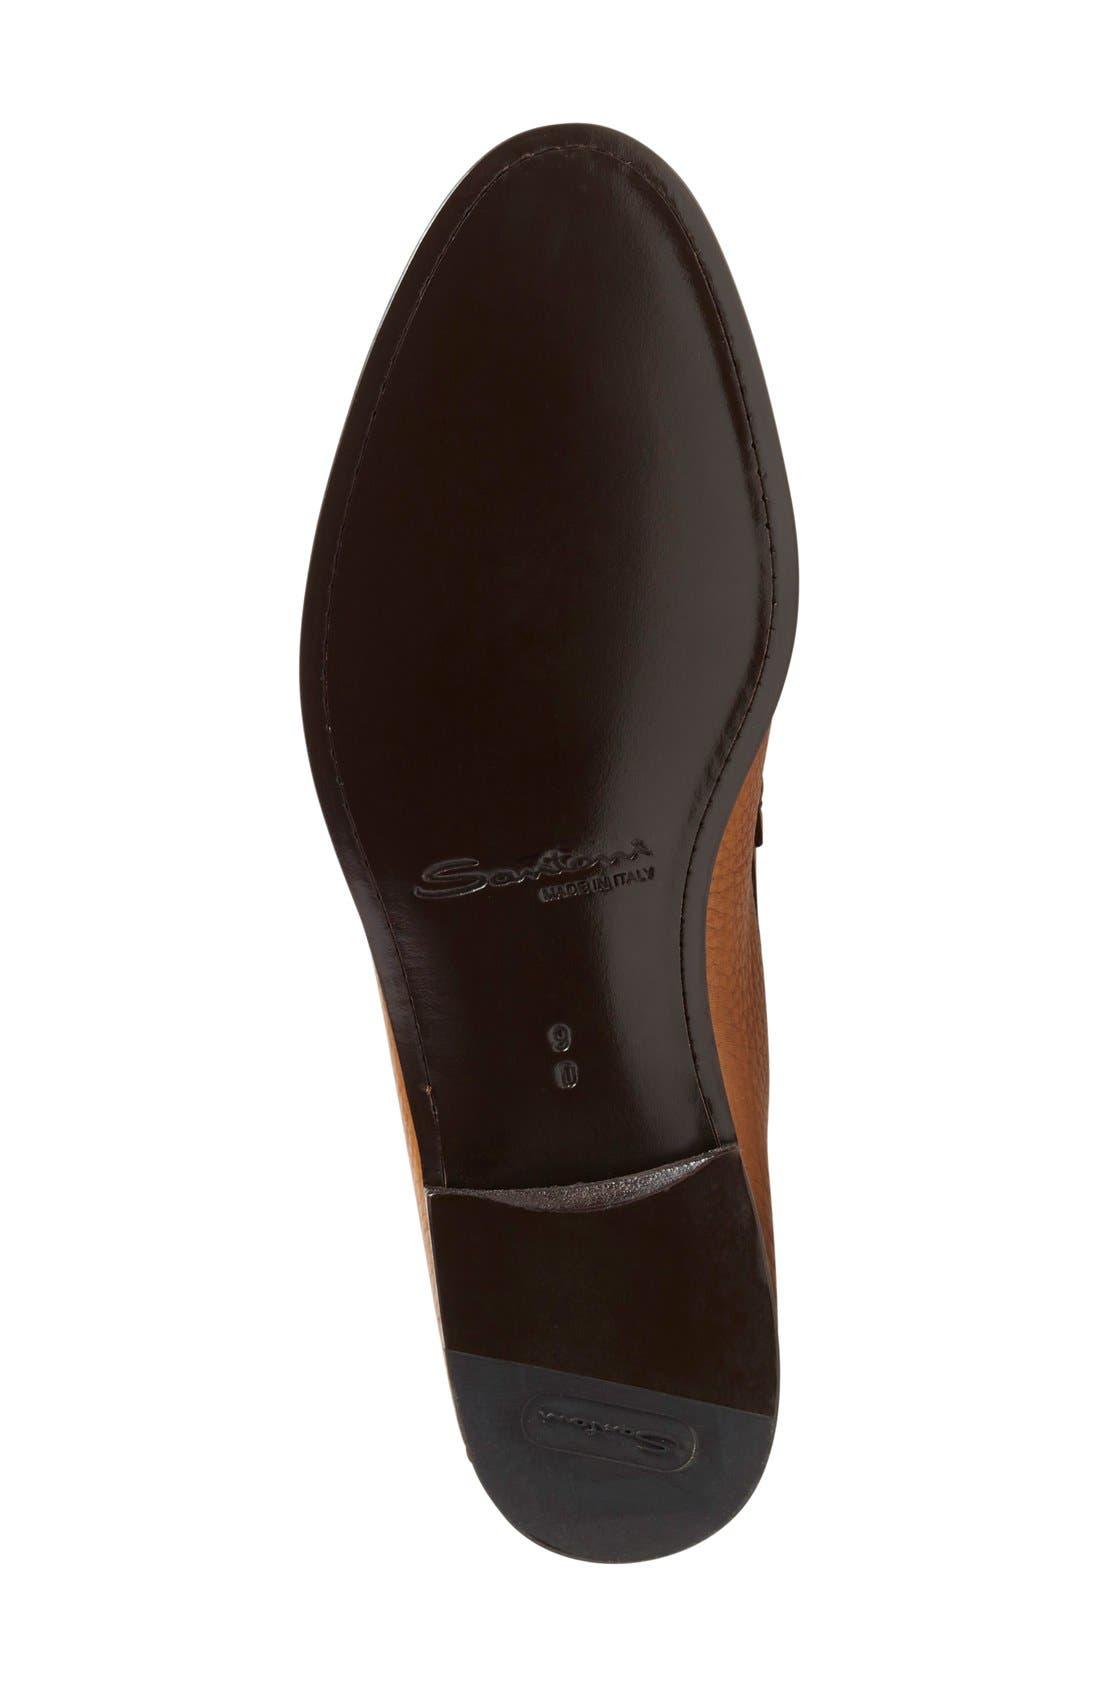 'Carmel' Penny Loafer,                             Alternate thumbnail 4, color,                             Tan Leather